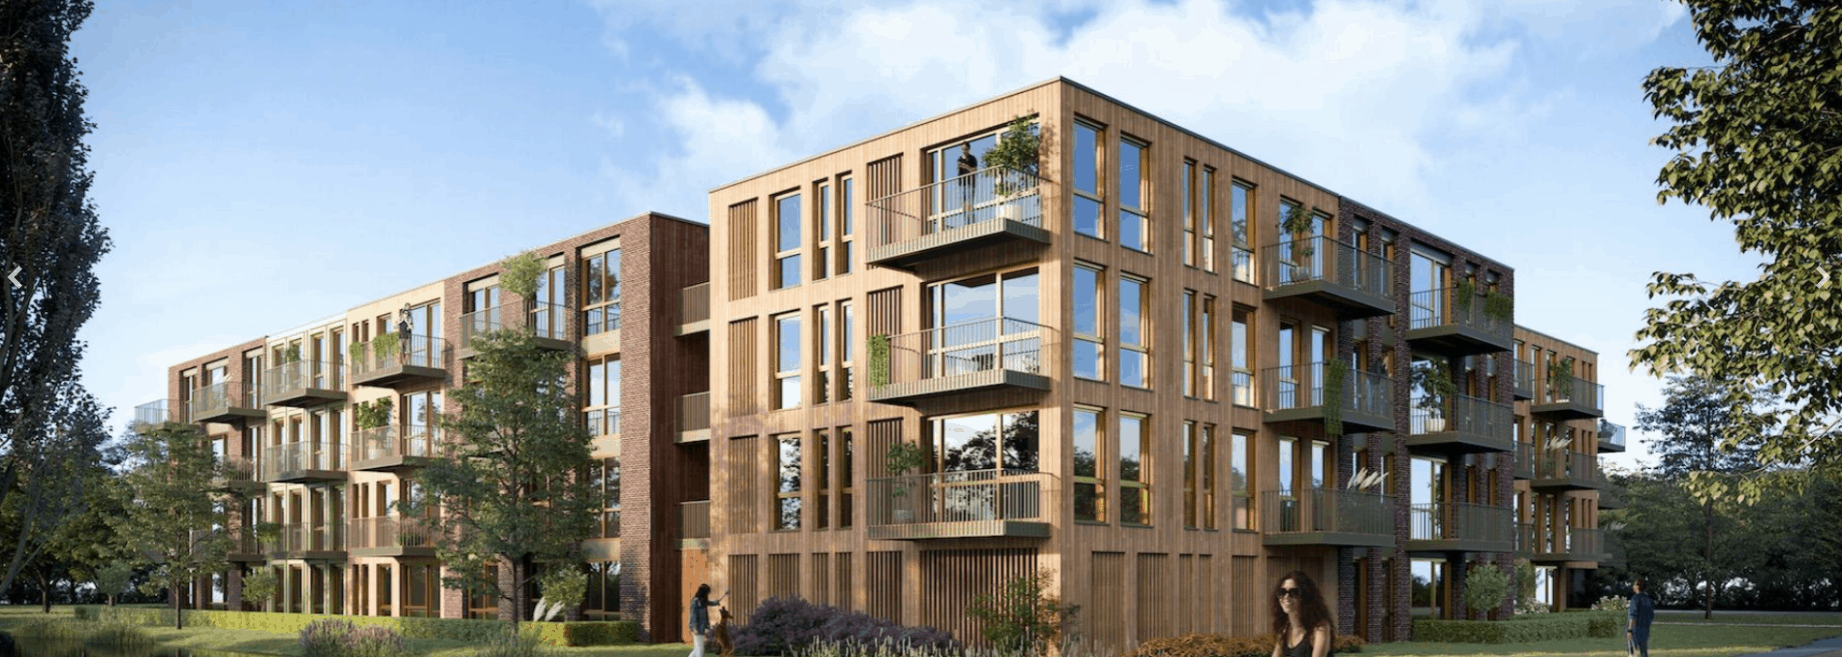 MDAM Impressie Finch Buildings 01-2021